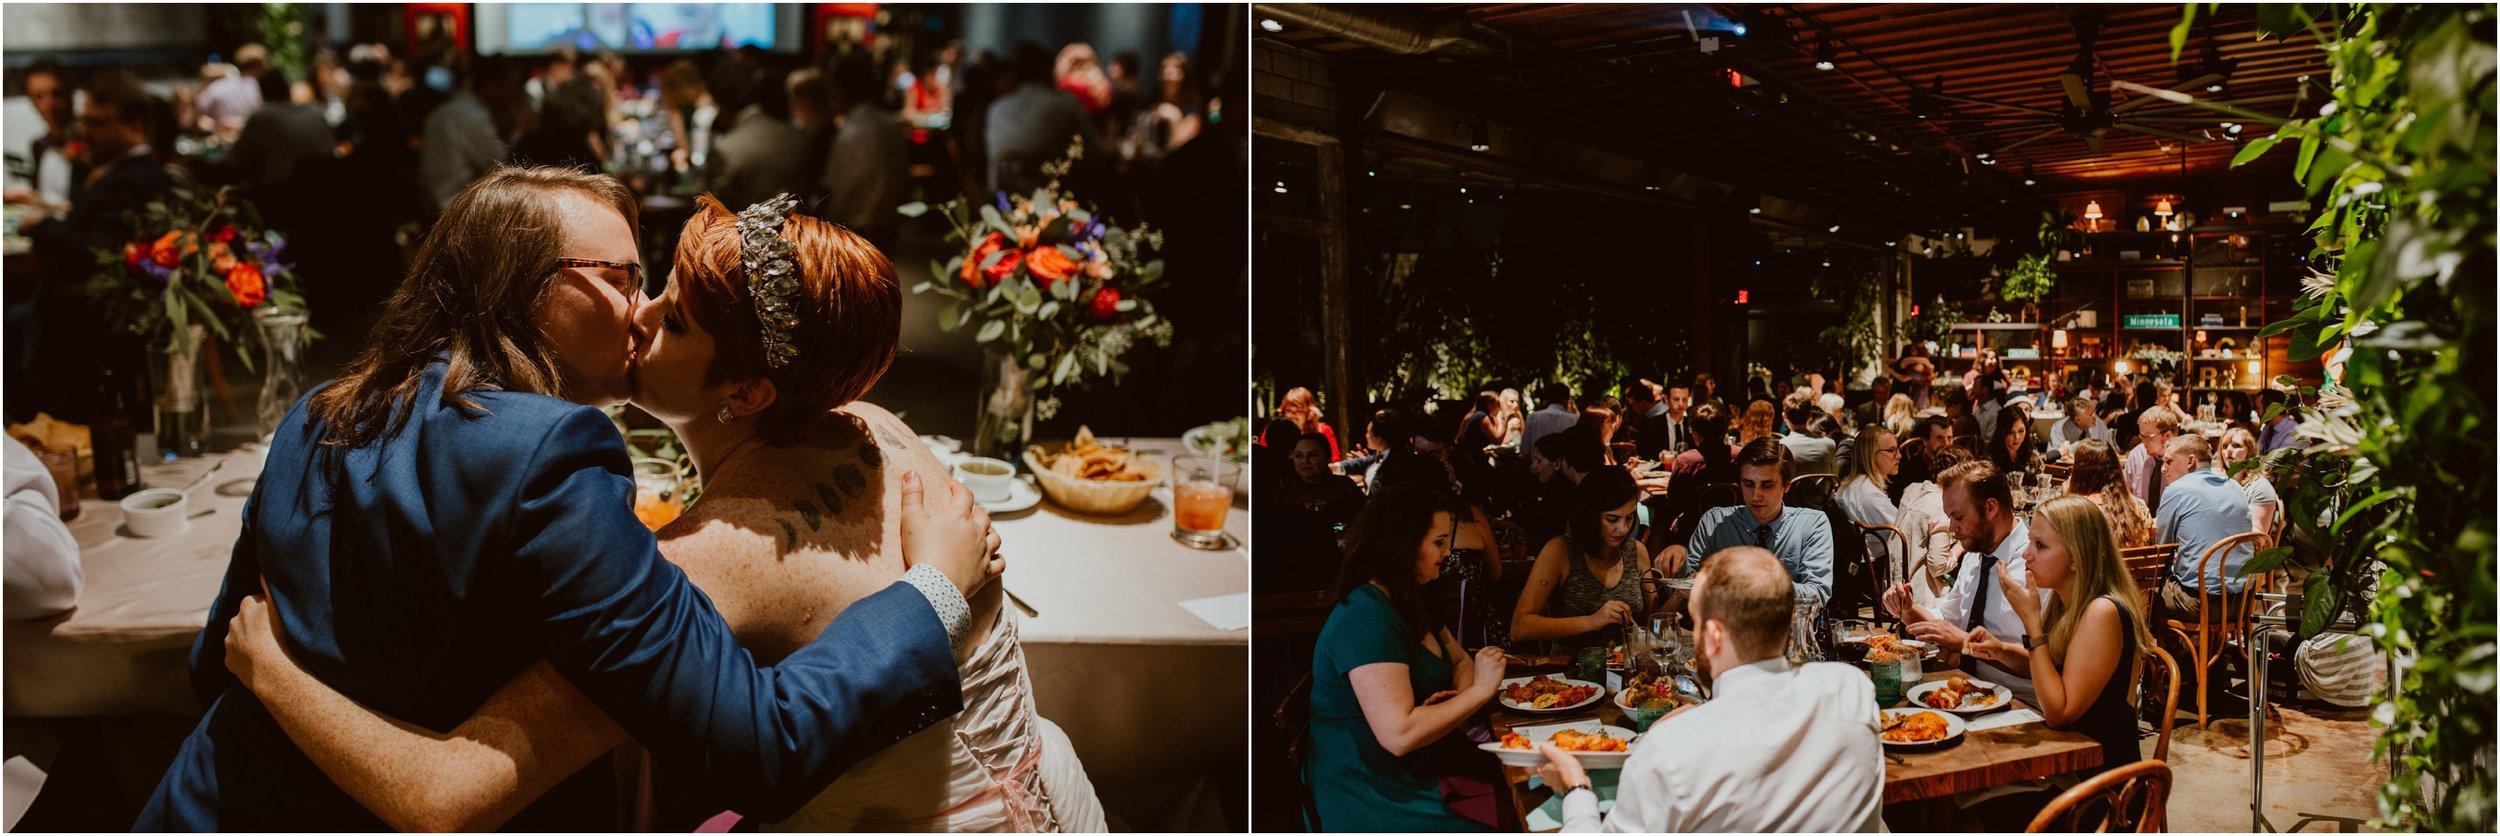 Smogshoppe-Wedding-S+C-Diana-Lake-Photography-1028.jpg